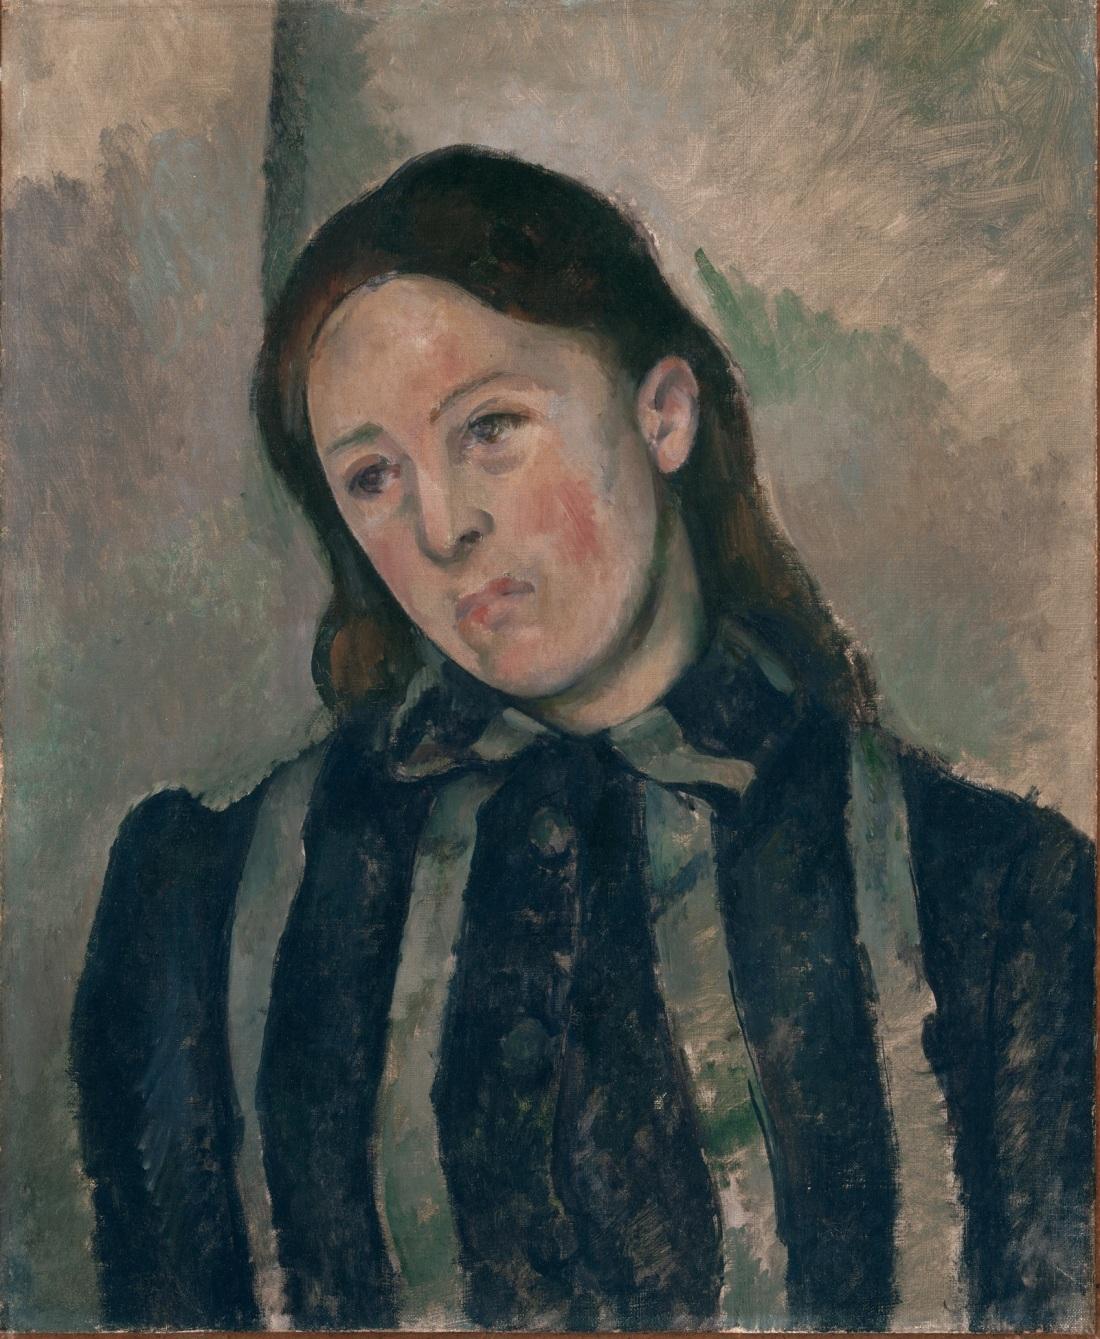 Paul Cezanne, Portrait of Madame Cezanne, 1890-92. Collection of the Philadelphia Museum of Art.